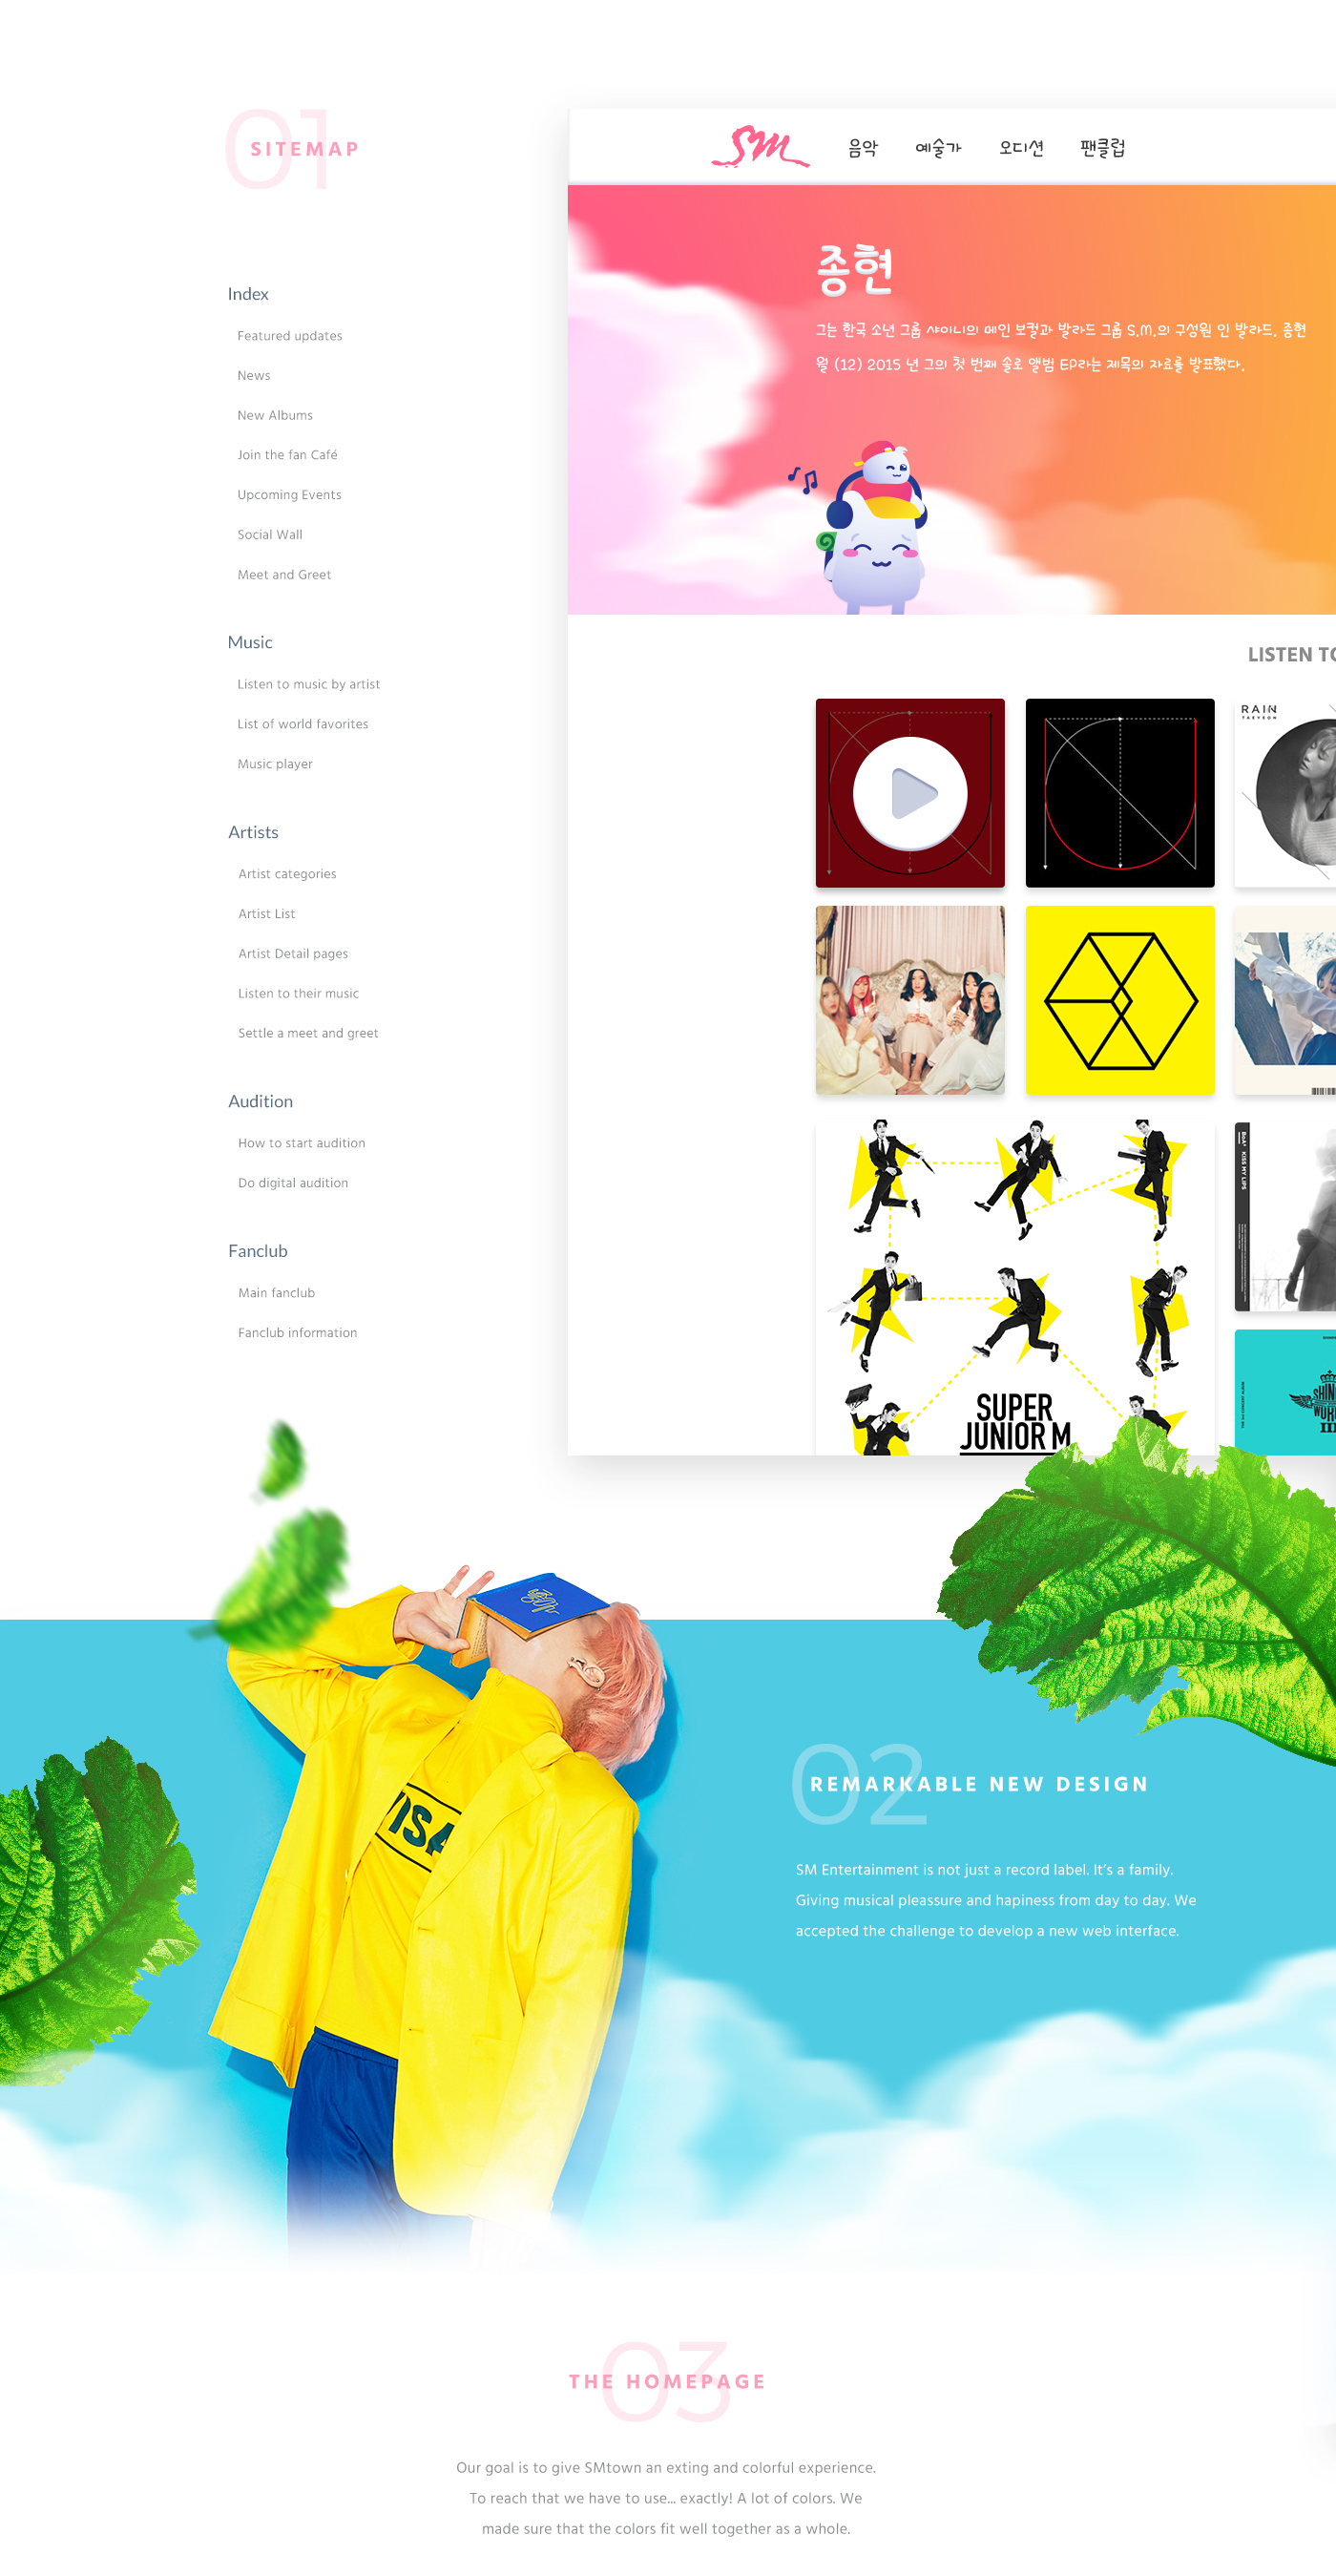 kpop asia Korea pink soft fresh record label